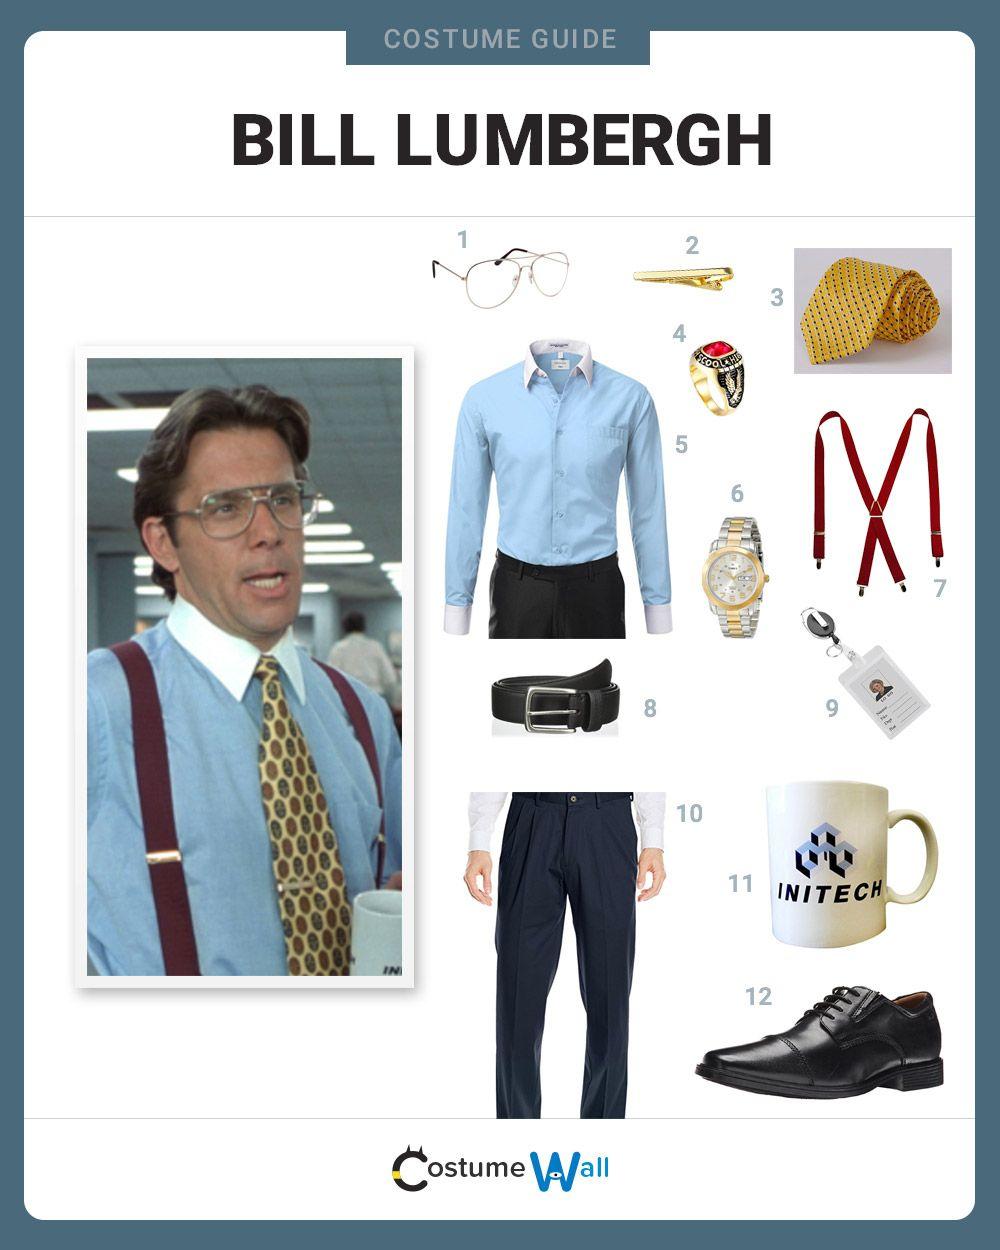 Office Space Bill Lumbergh Meme